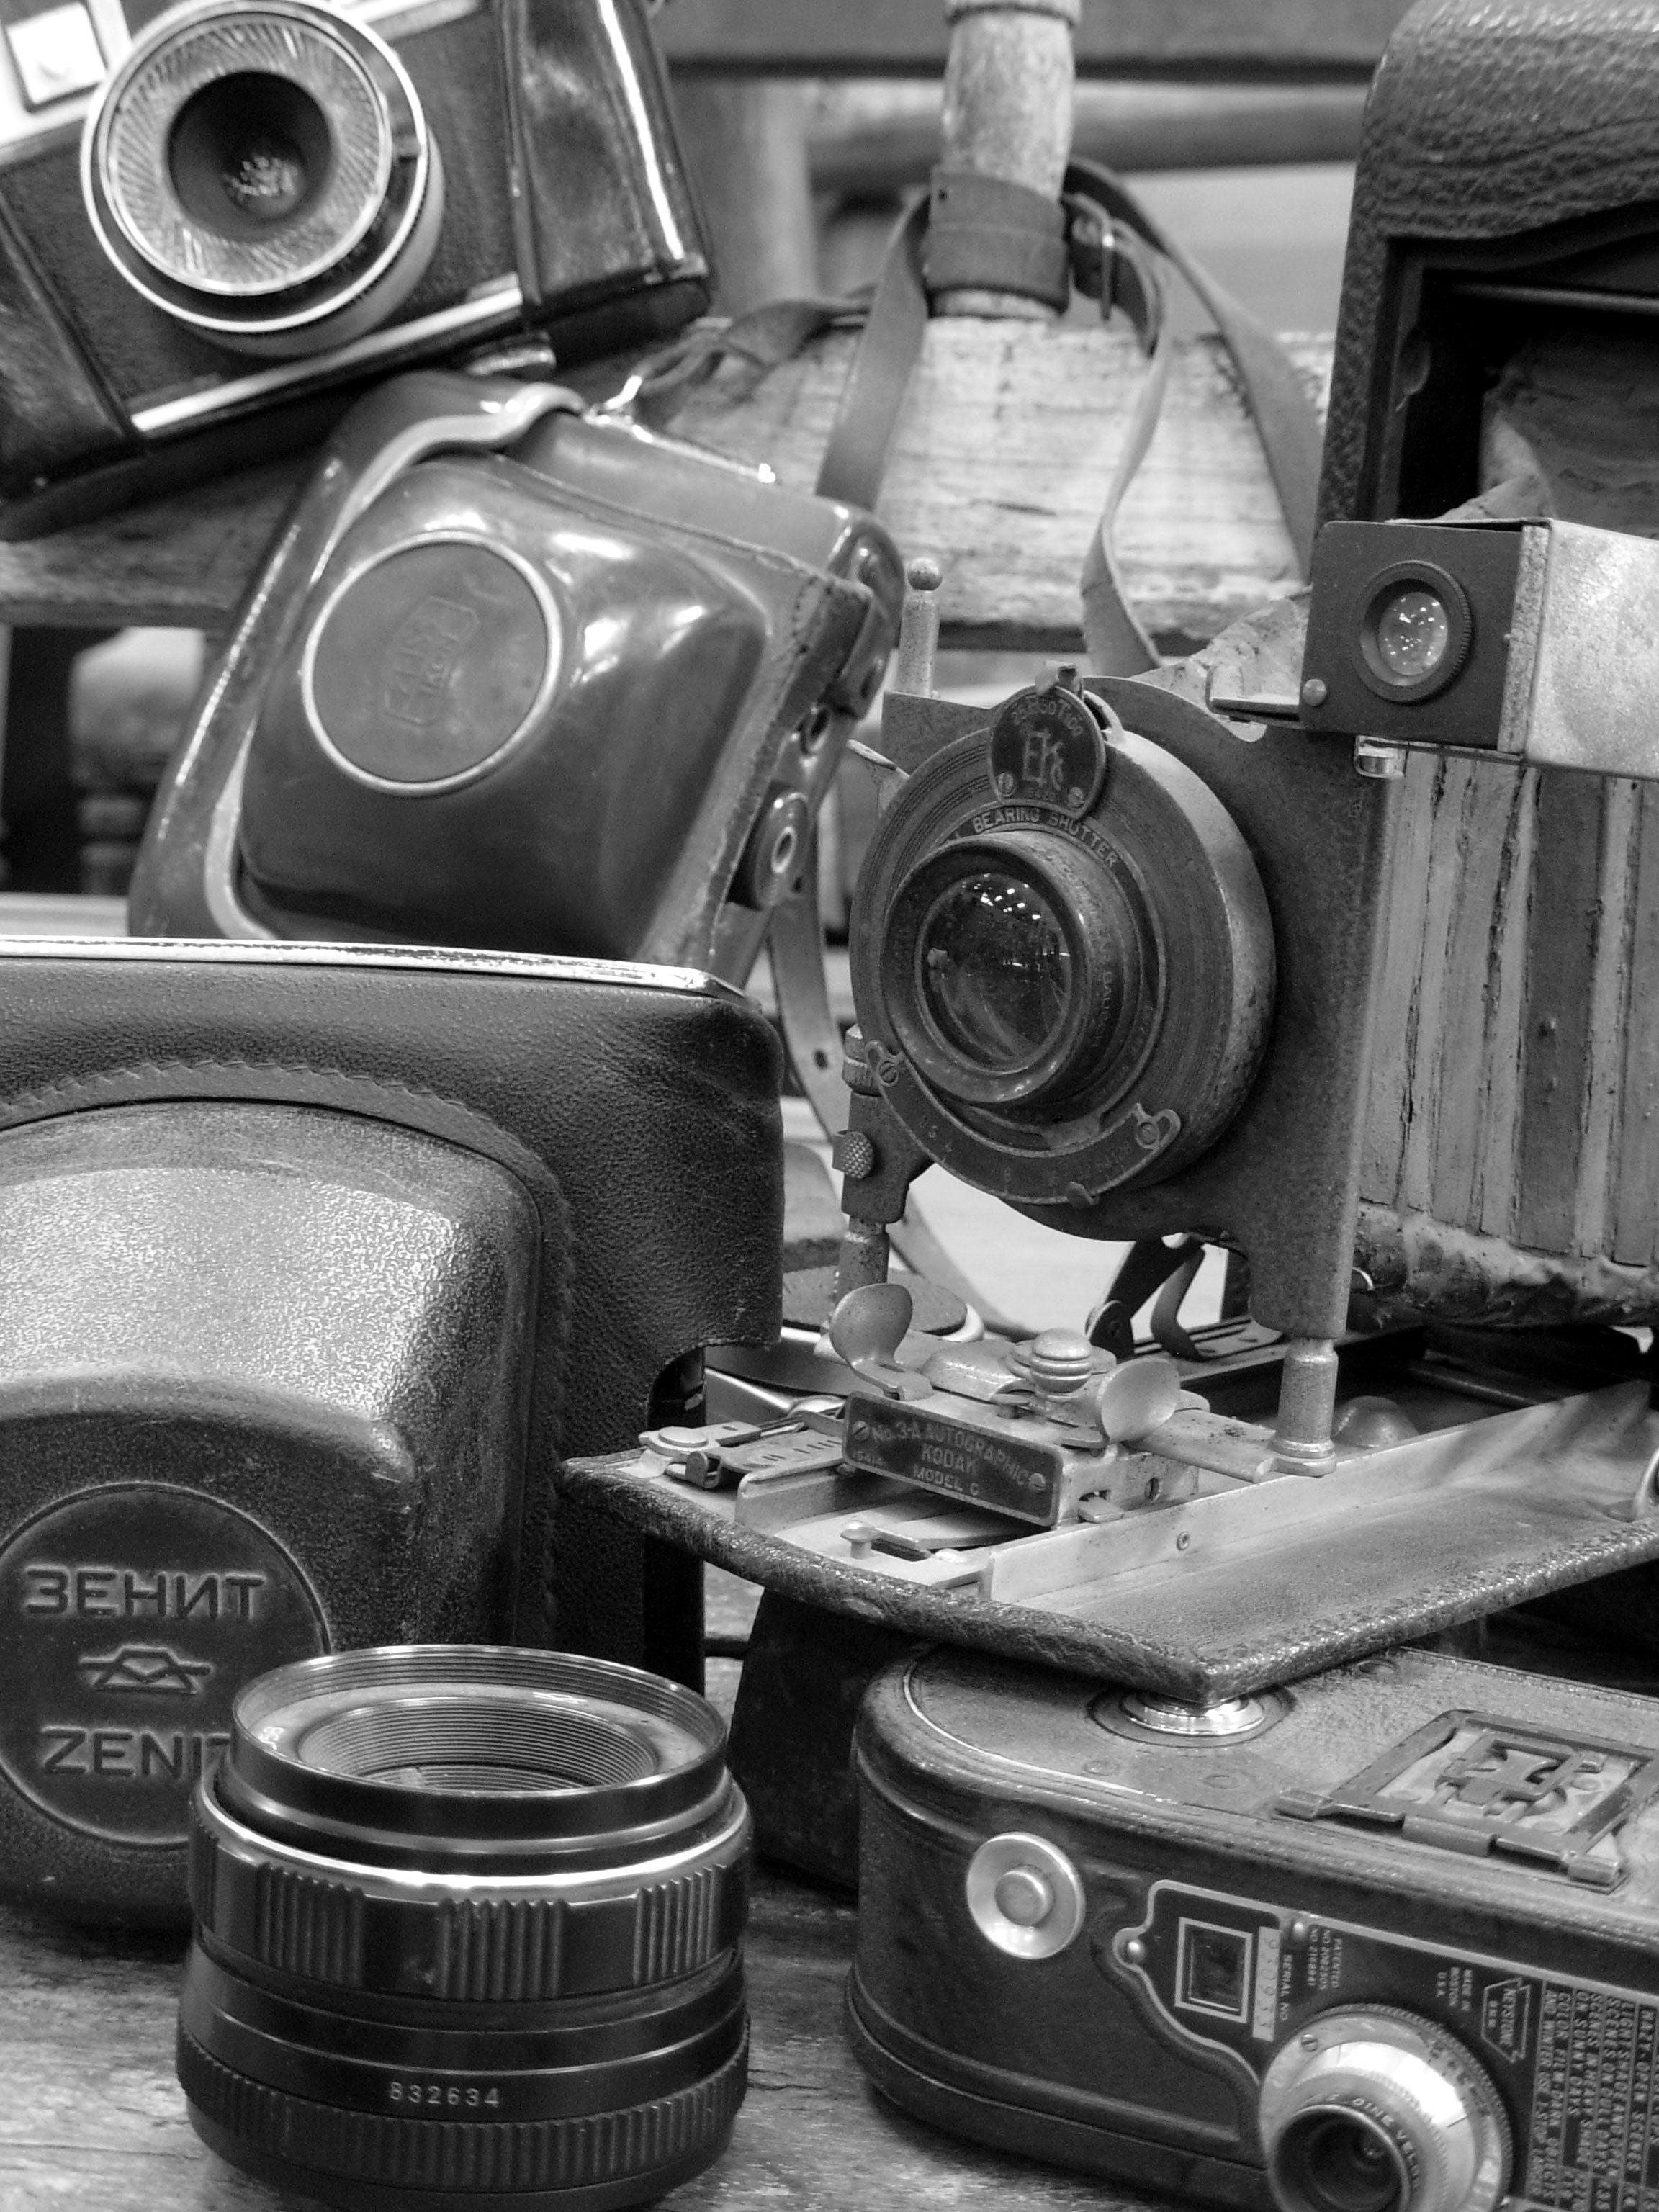 Máquina fotográfica, Kodak Autographic 3A, Model C, Sonia Carroza Antiguedades